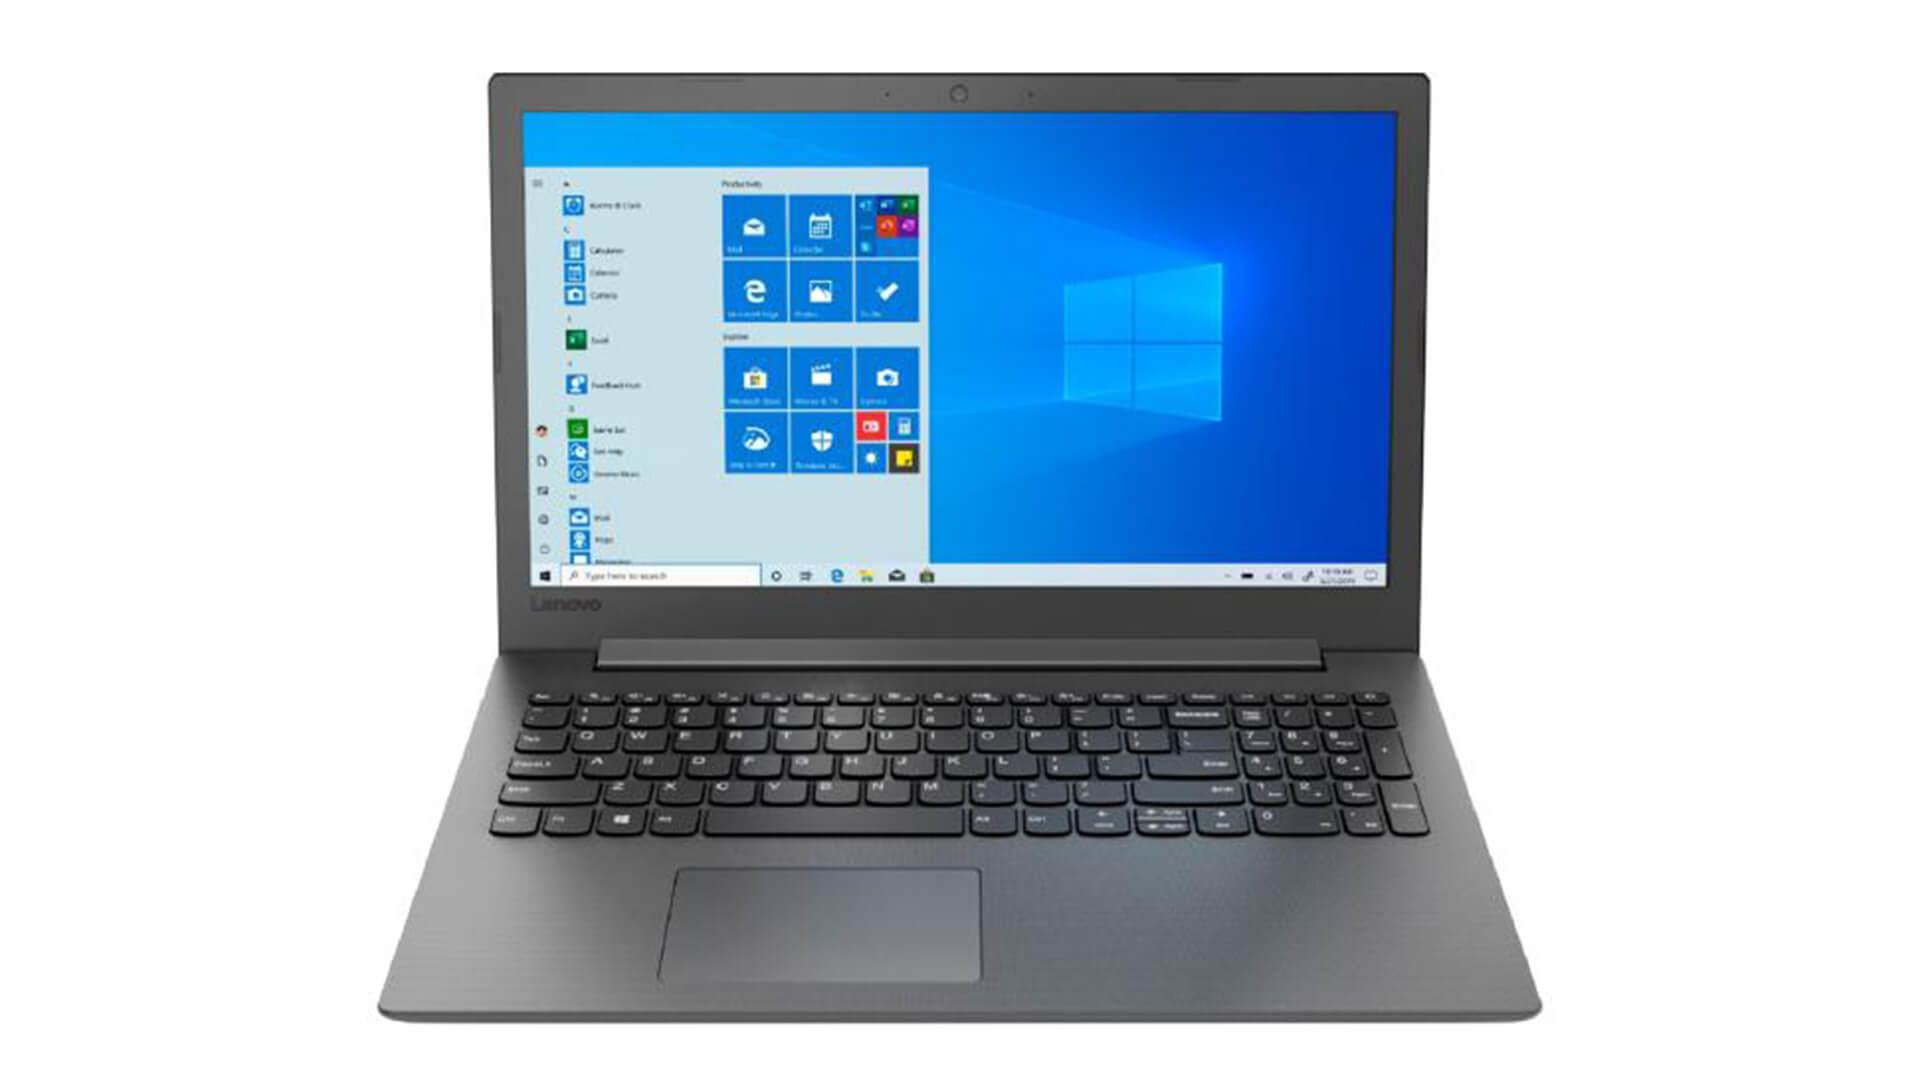 لپ تاپ لنوو Ideapad 130 - MX